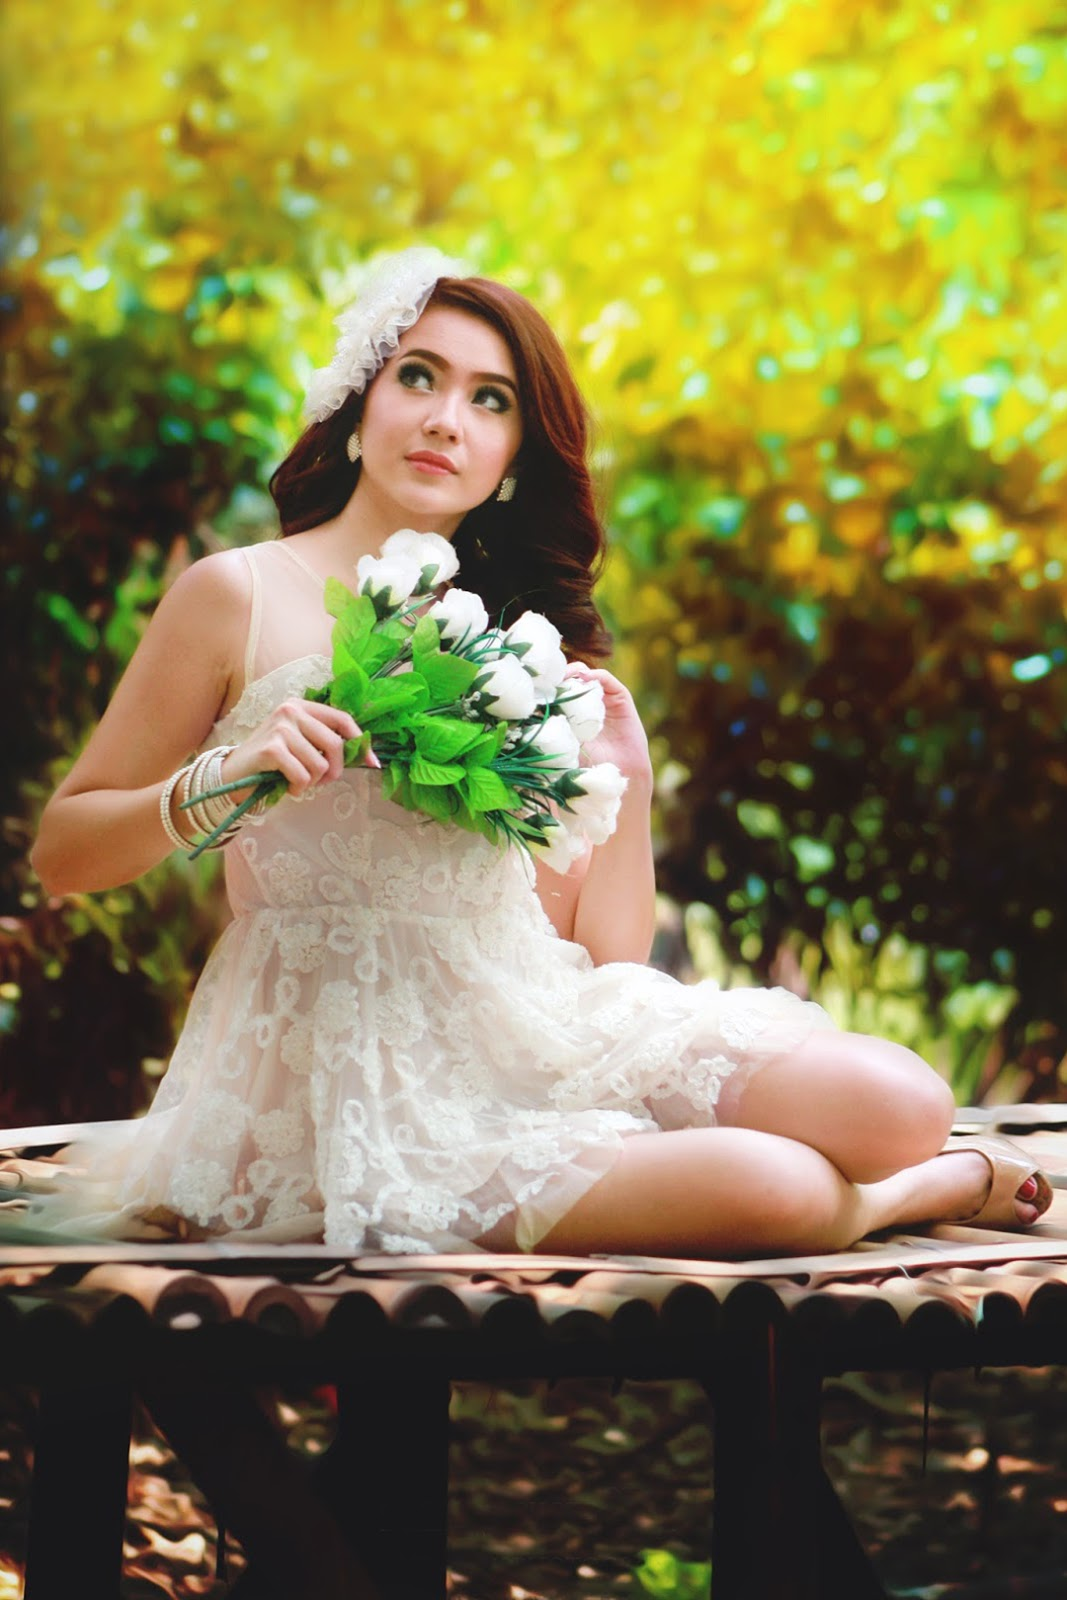 konsep foto Model Winny Valencia pengantin seksi dan hot